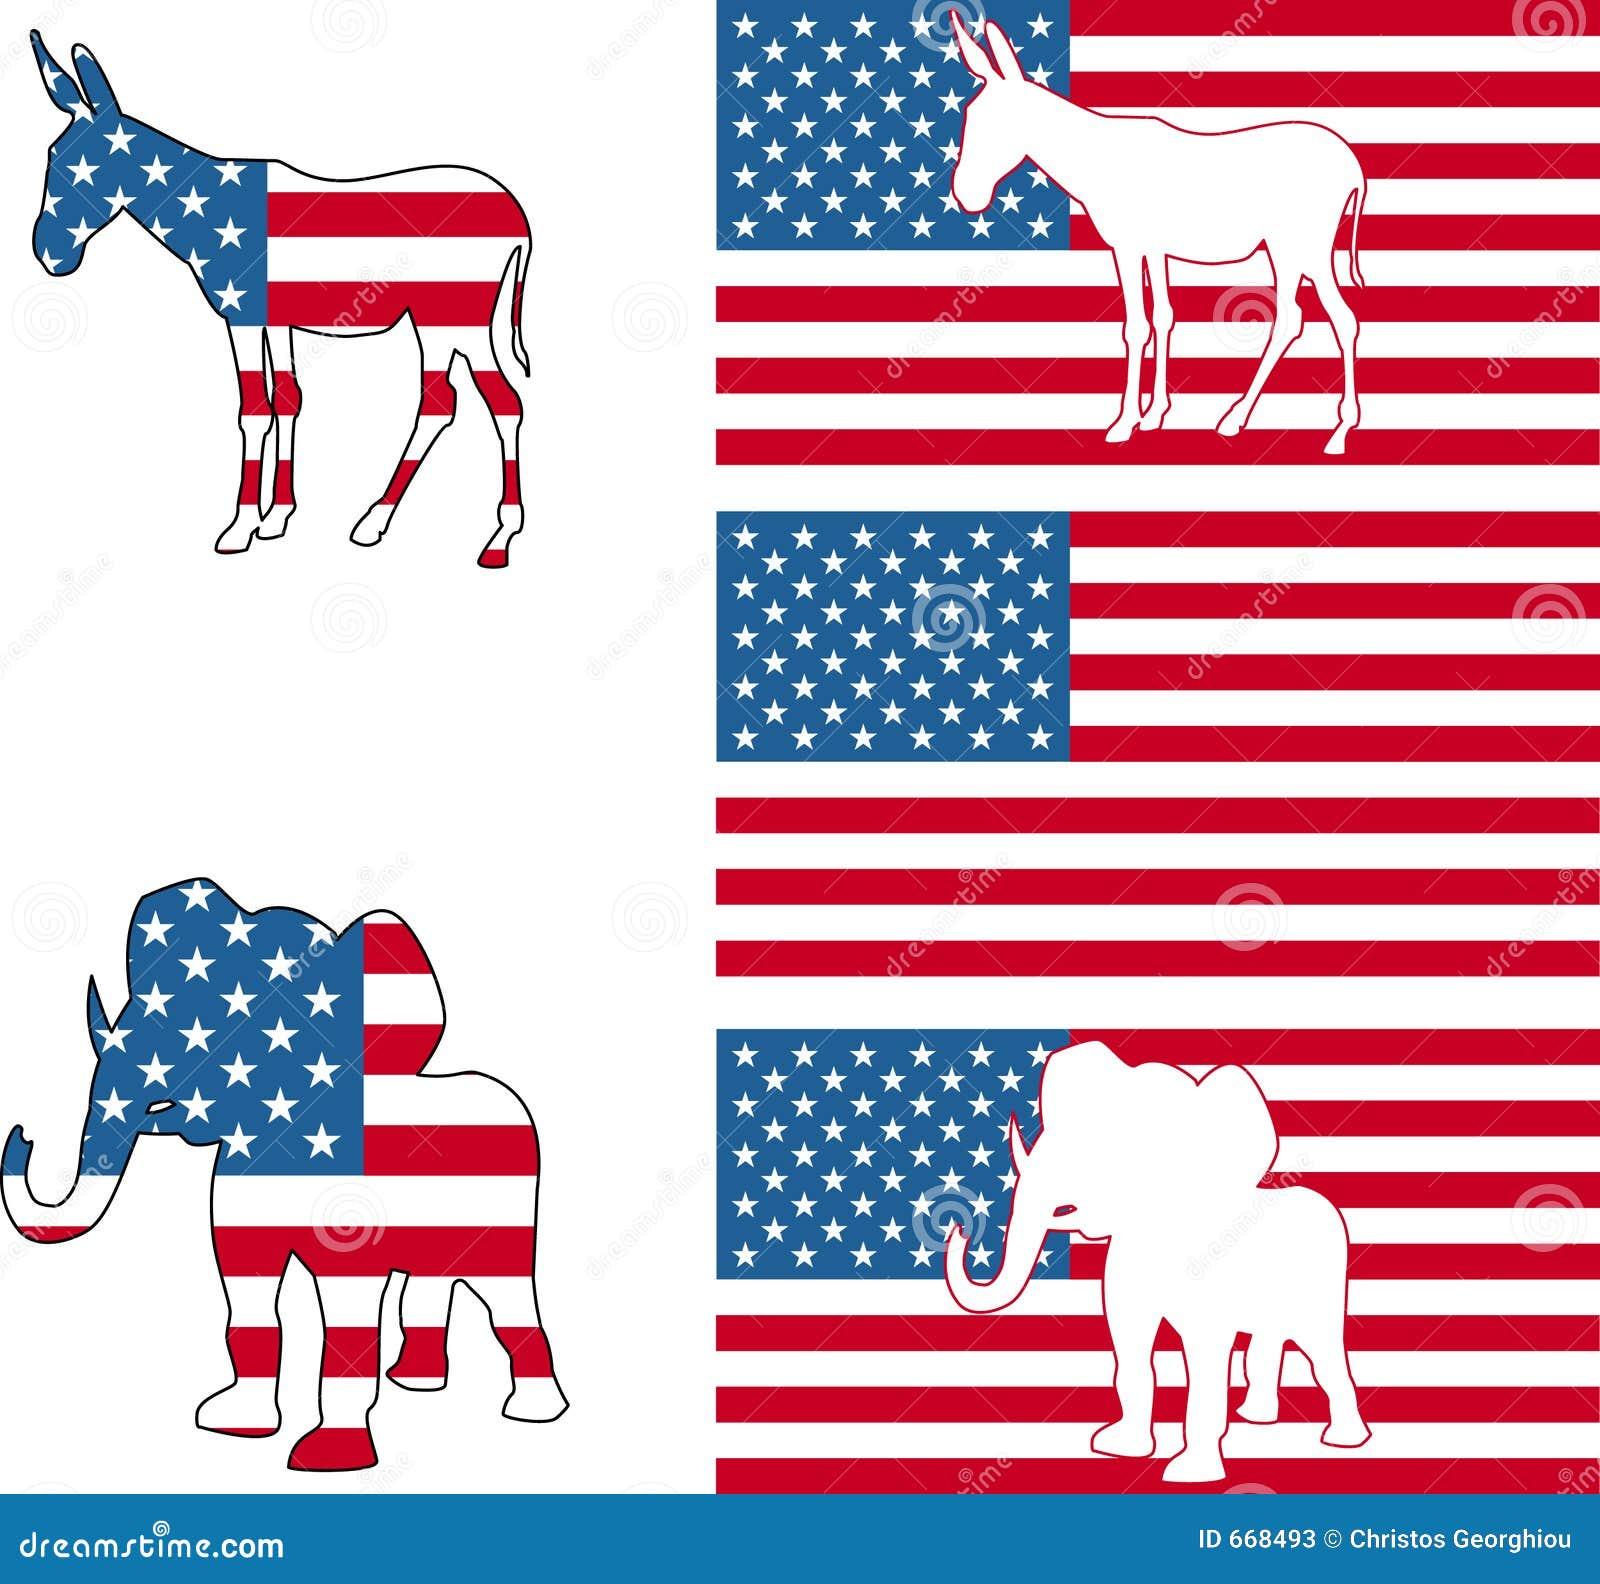 American Political Symbols Stock Photos - Image: 668493